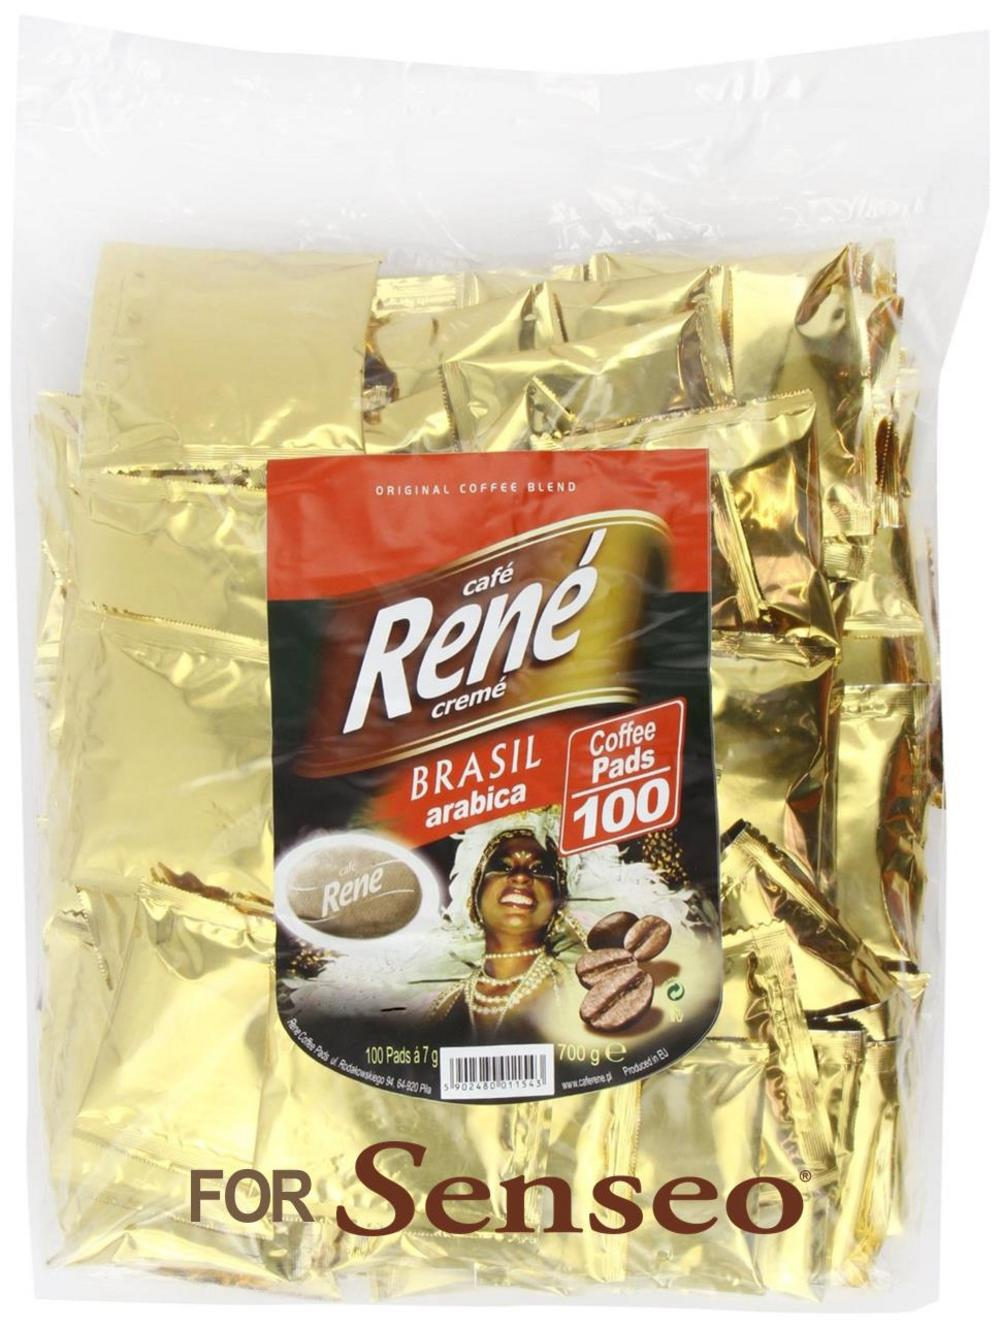 Philips Senseo 100 x Café Rene Crème Brasil Coffee Pads Bags Pods